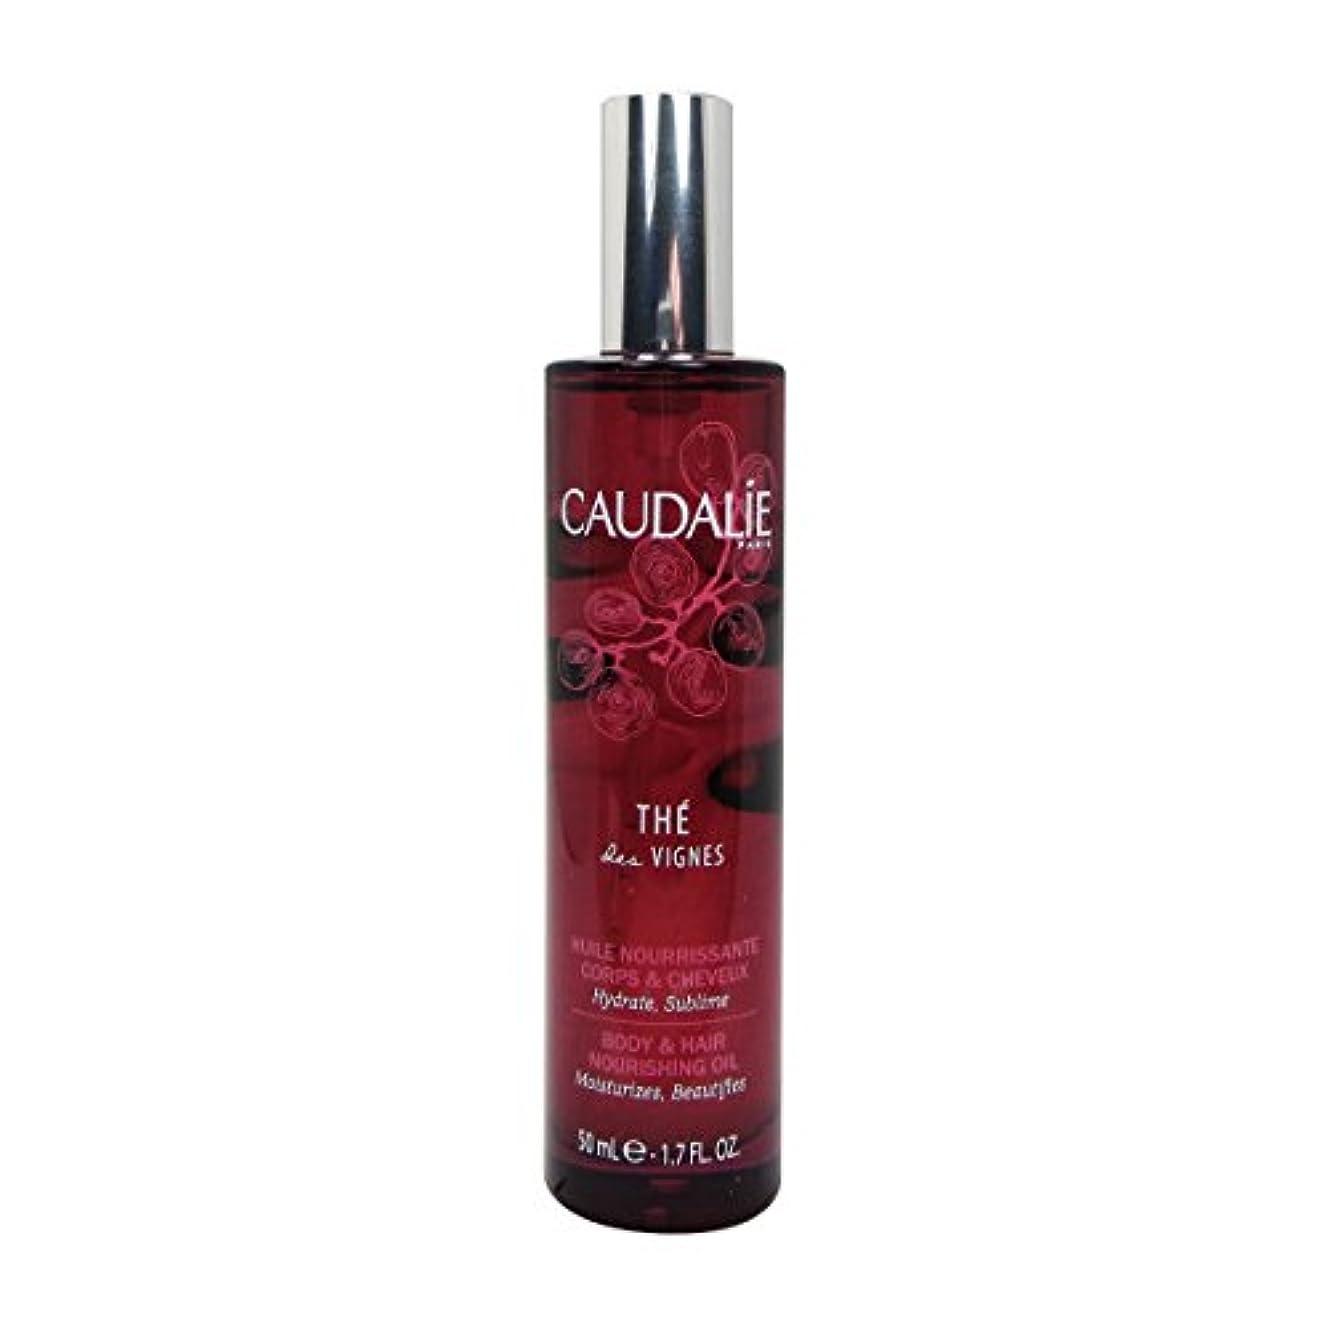 Caudalie Th De Vignes Hair And Body Oil 50ml [並行輸入品]